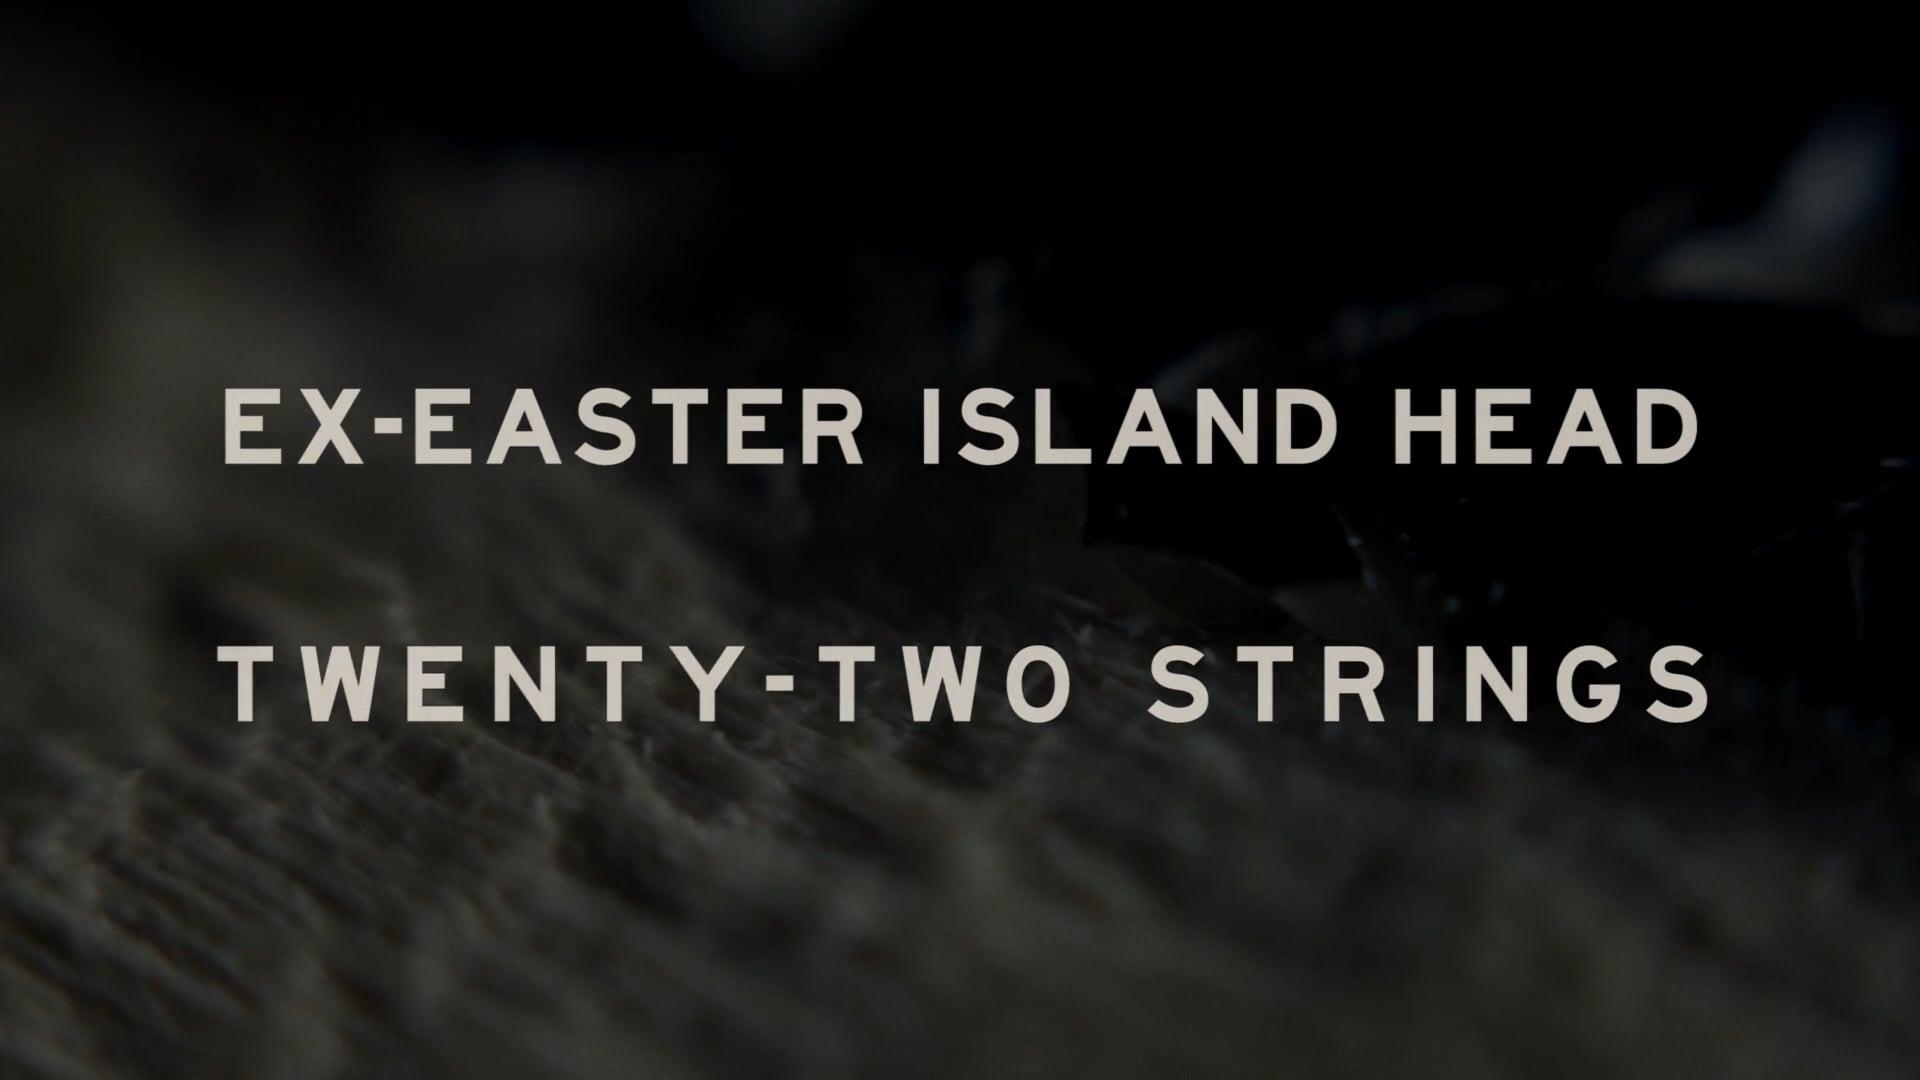 Ex-Easter Island Head - Twenty-Two Strings